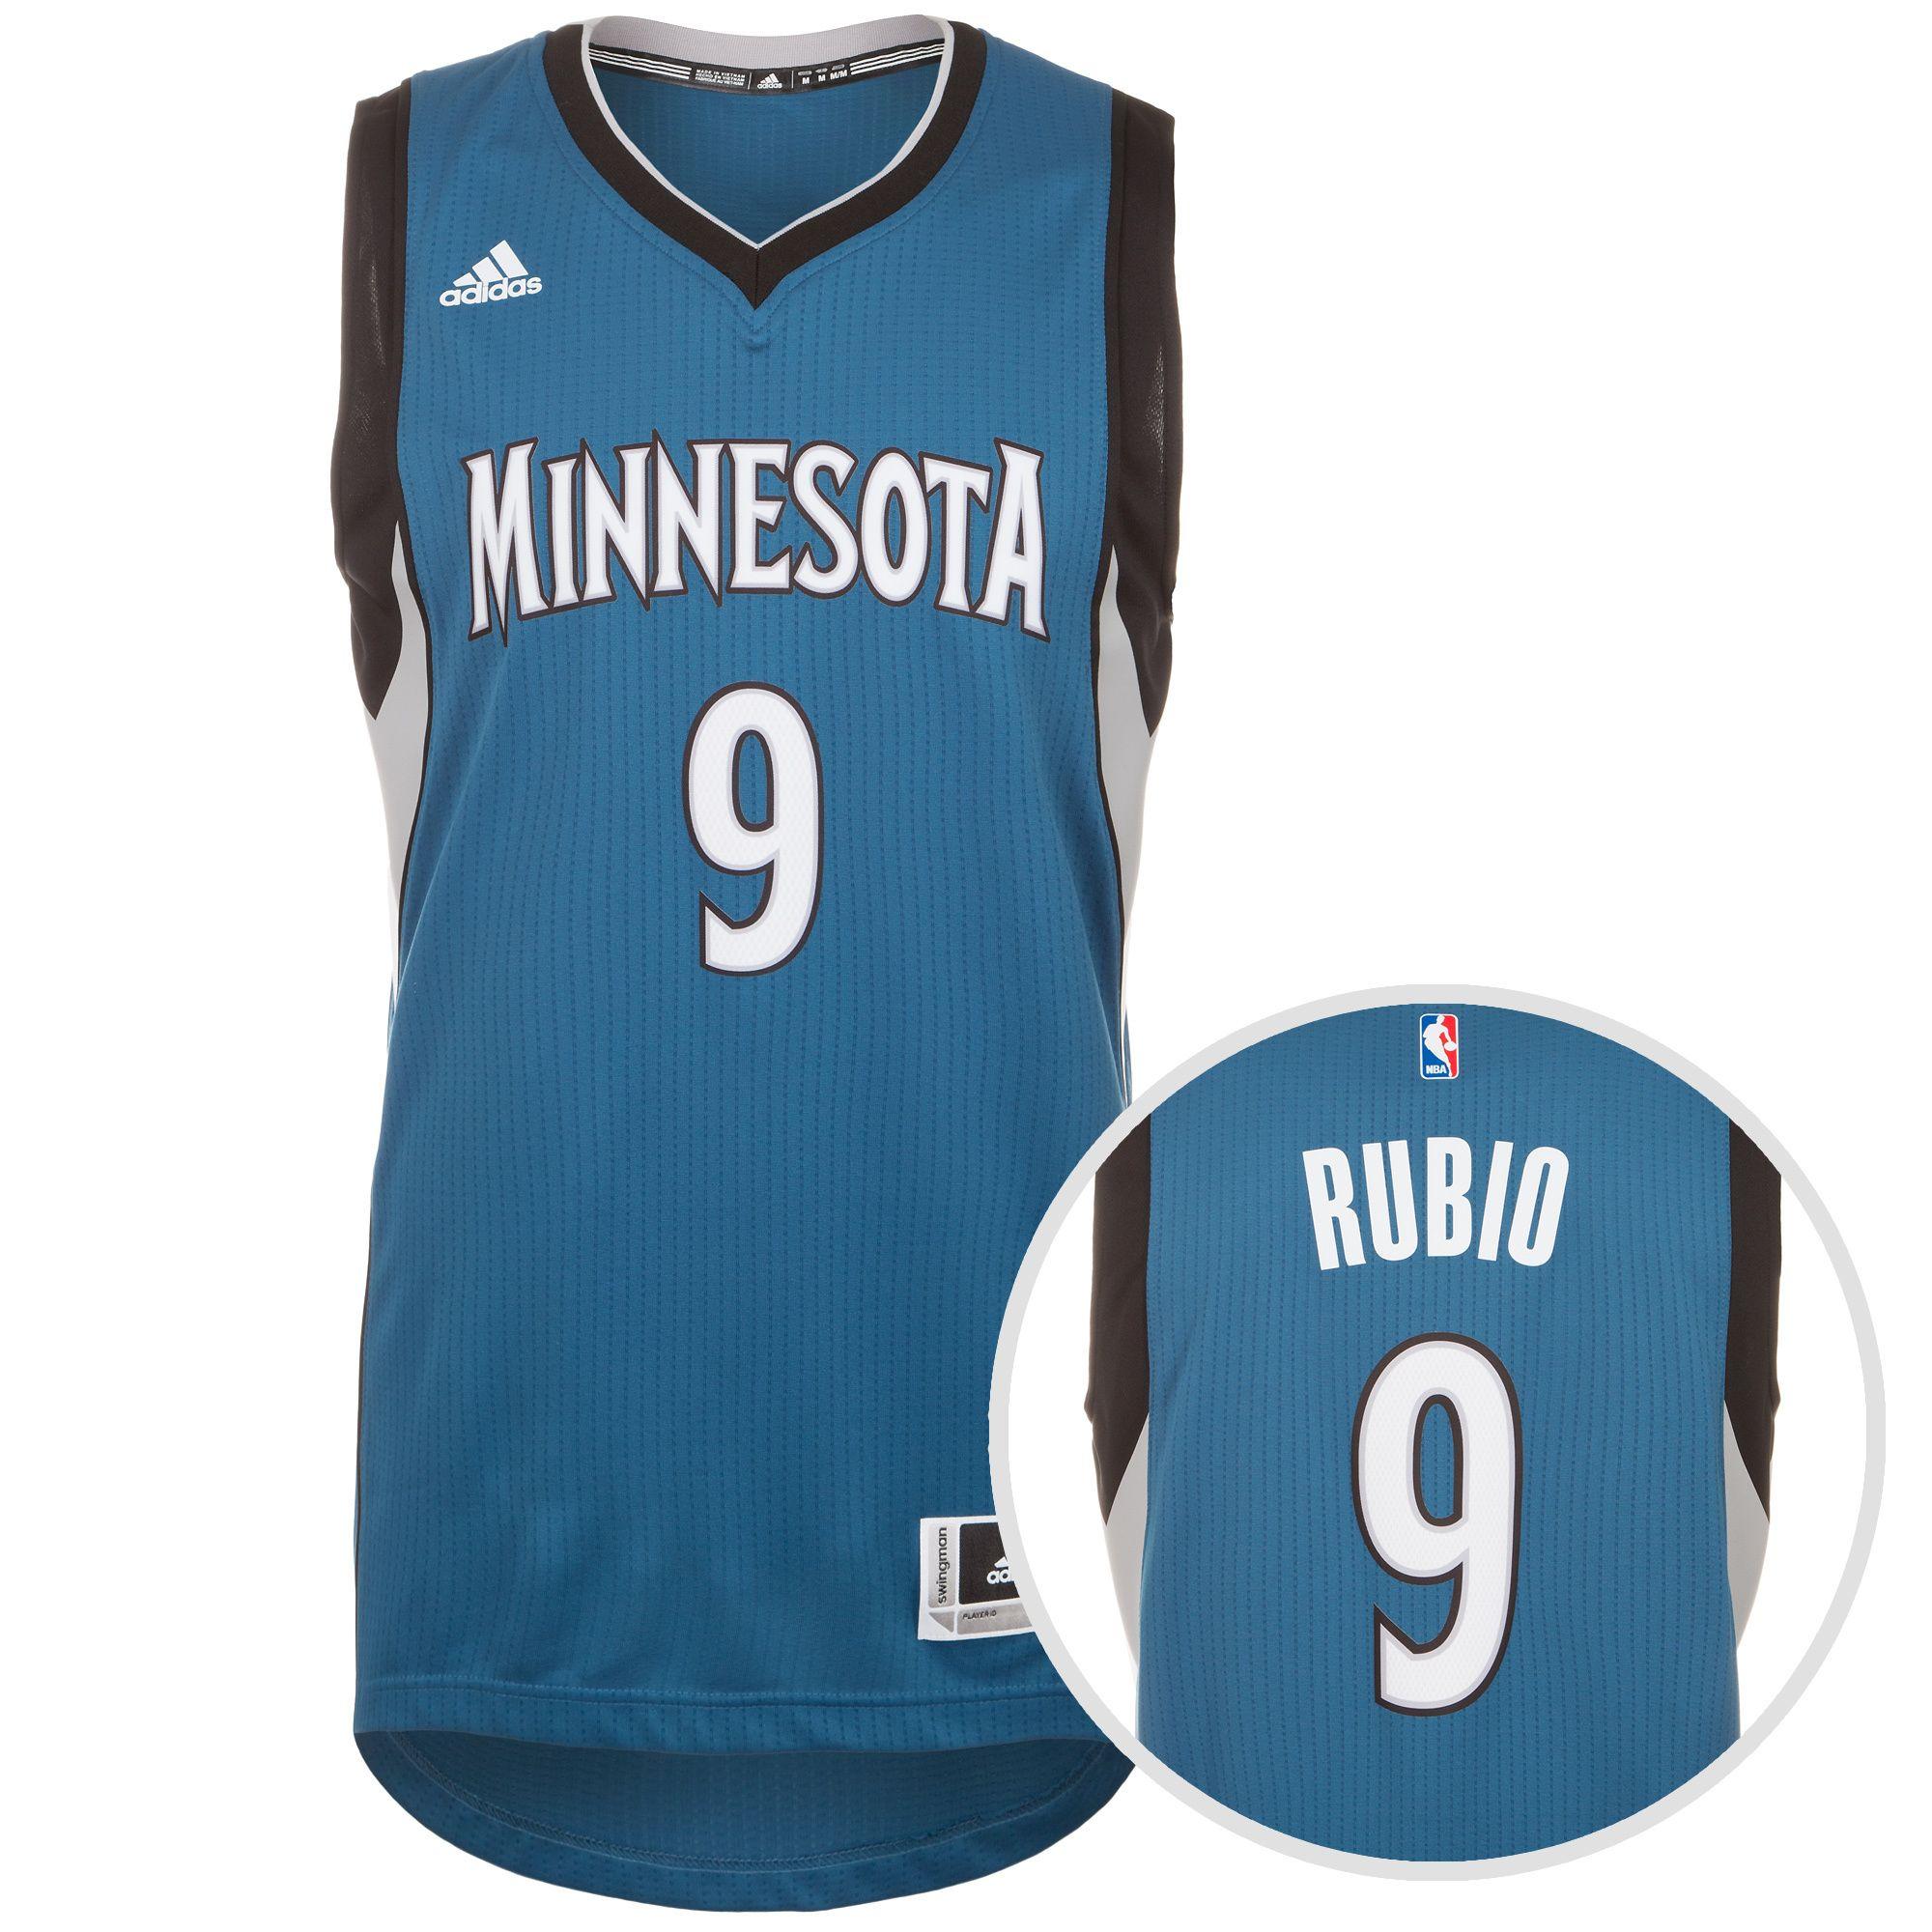 ADIDAS PERFORMANCE adidas Performance Minnesota Rubio Swingman Basketballtrikot Herren